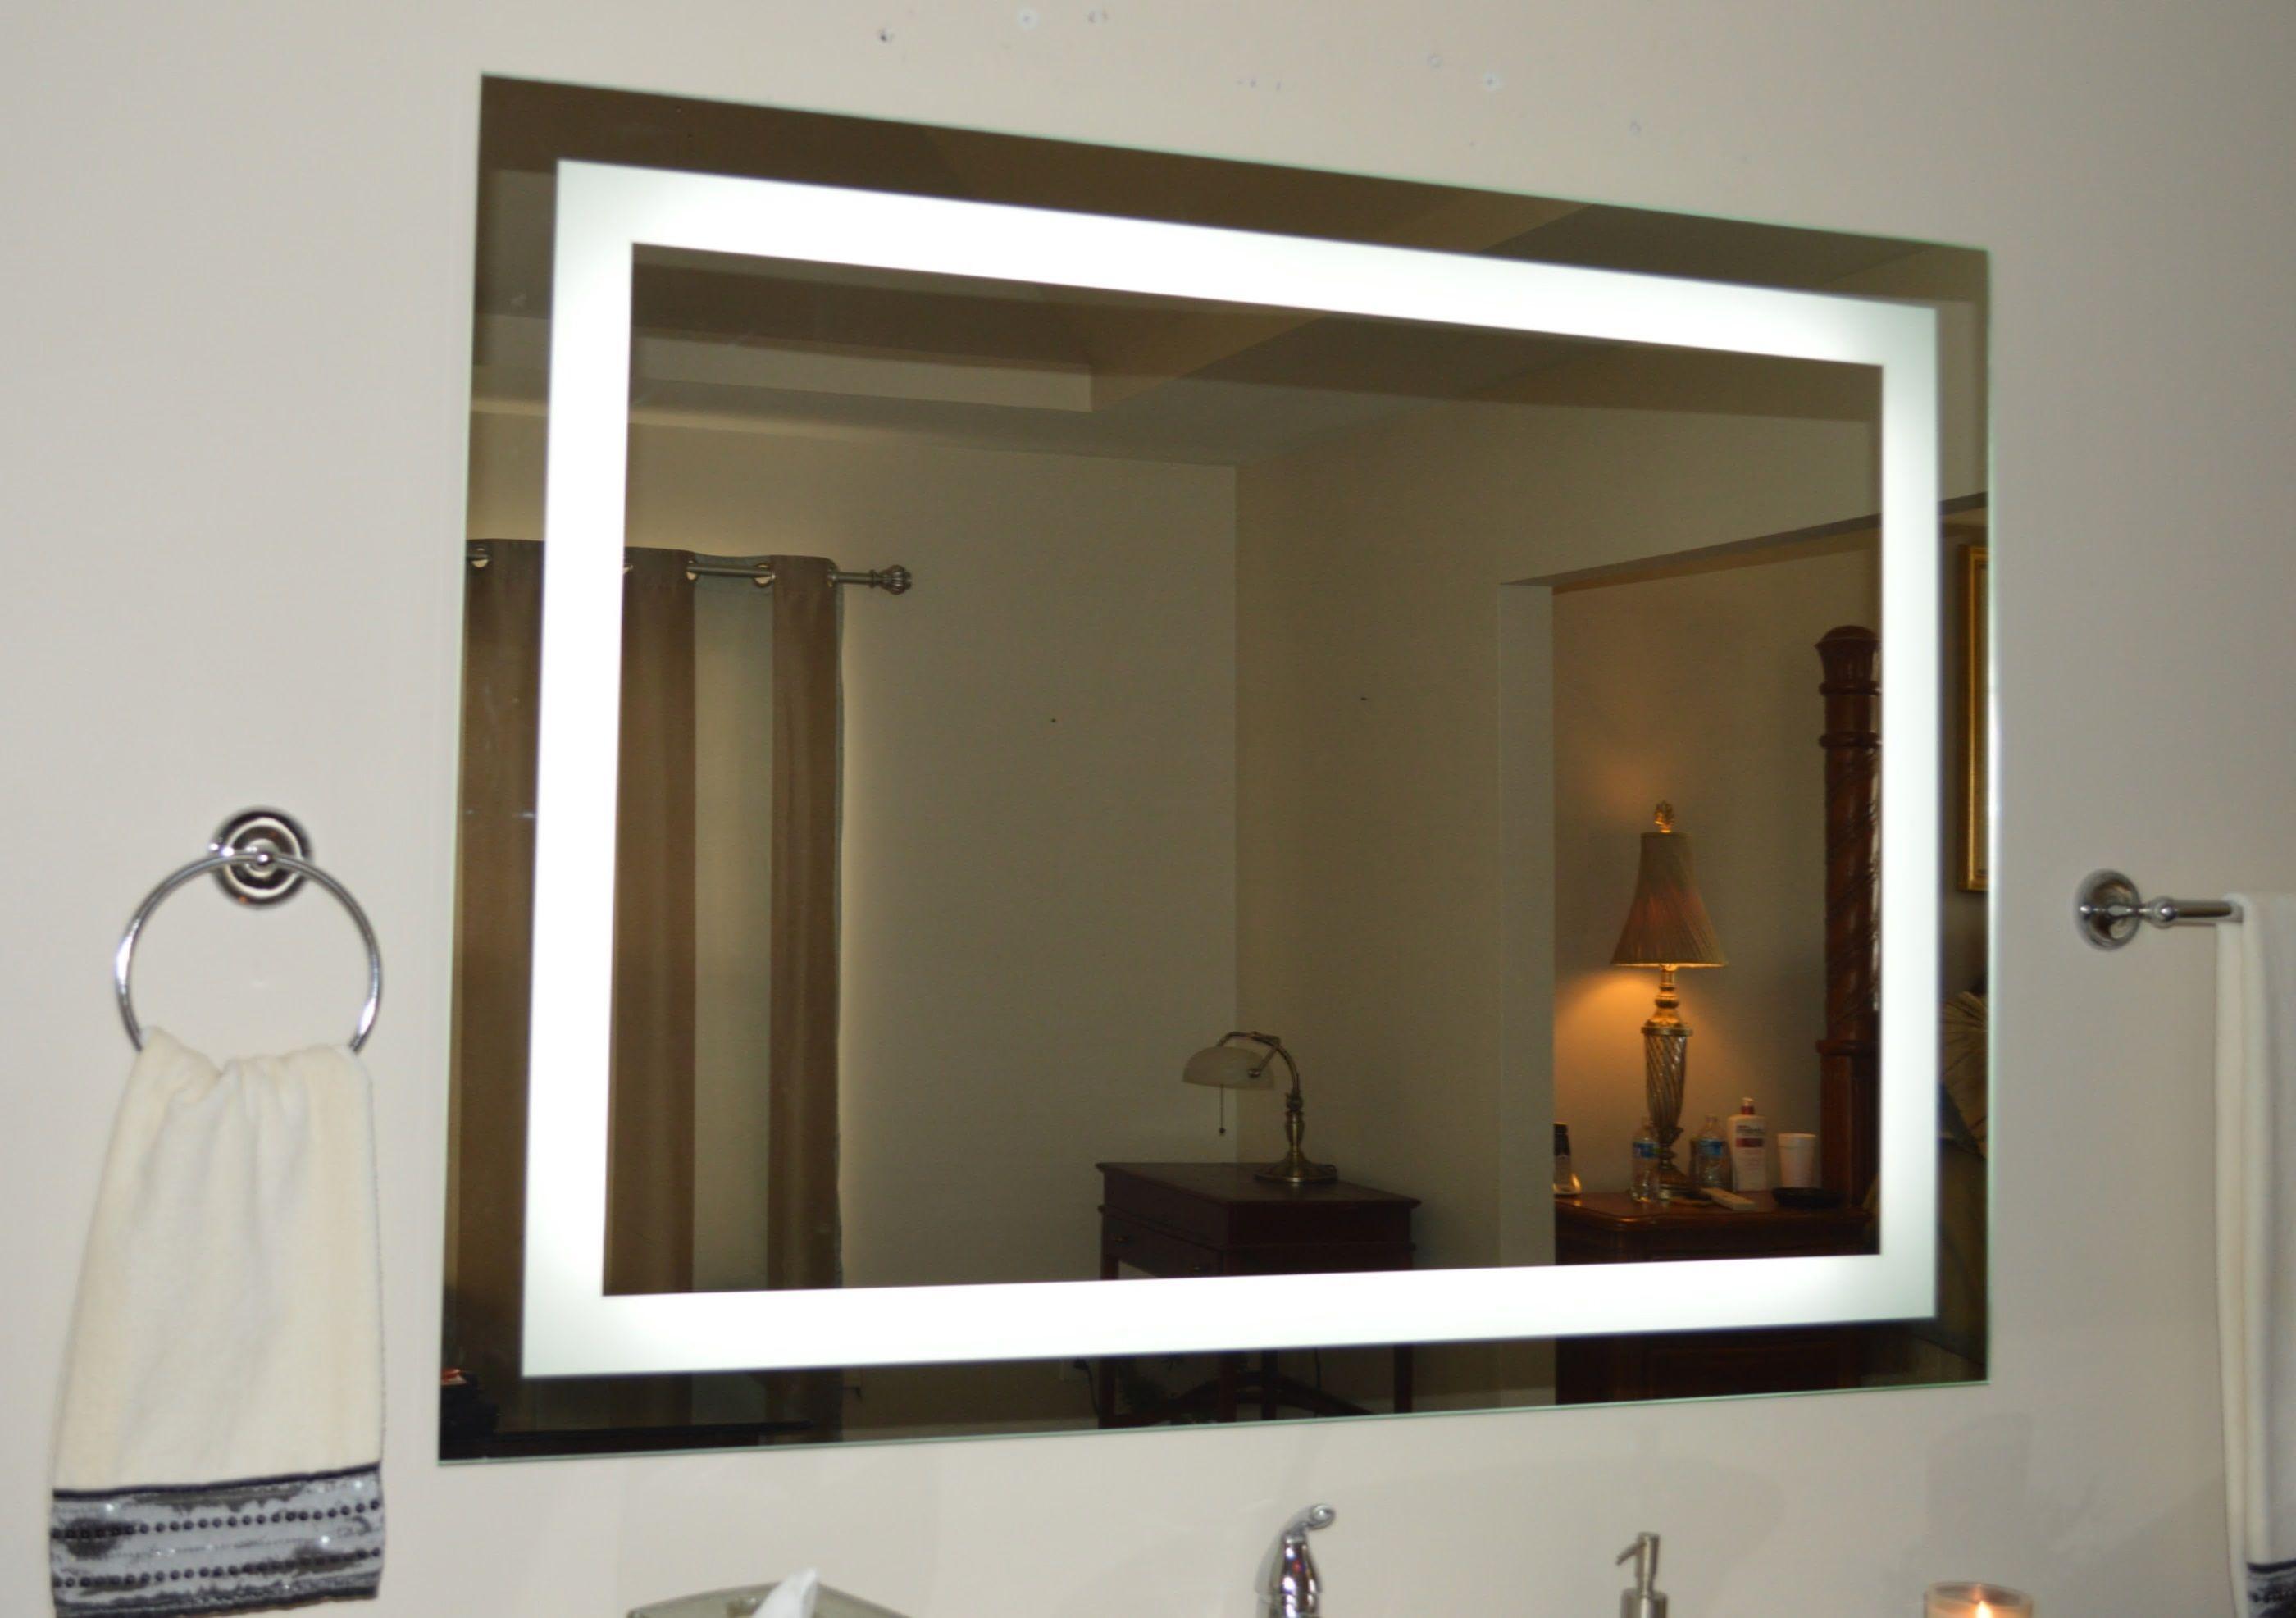 Front Lighted Led Bathroom Vanity Mirror 48 Mirror Cabinet With Light Bathroom Mirror Lights Lighted Vanity Mirror